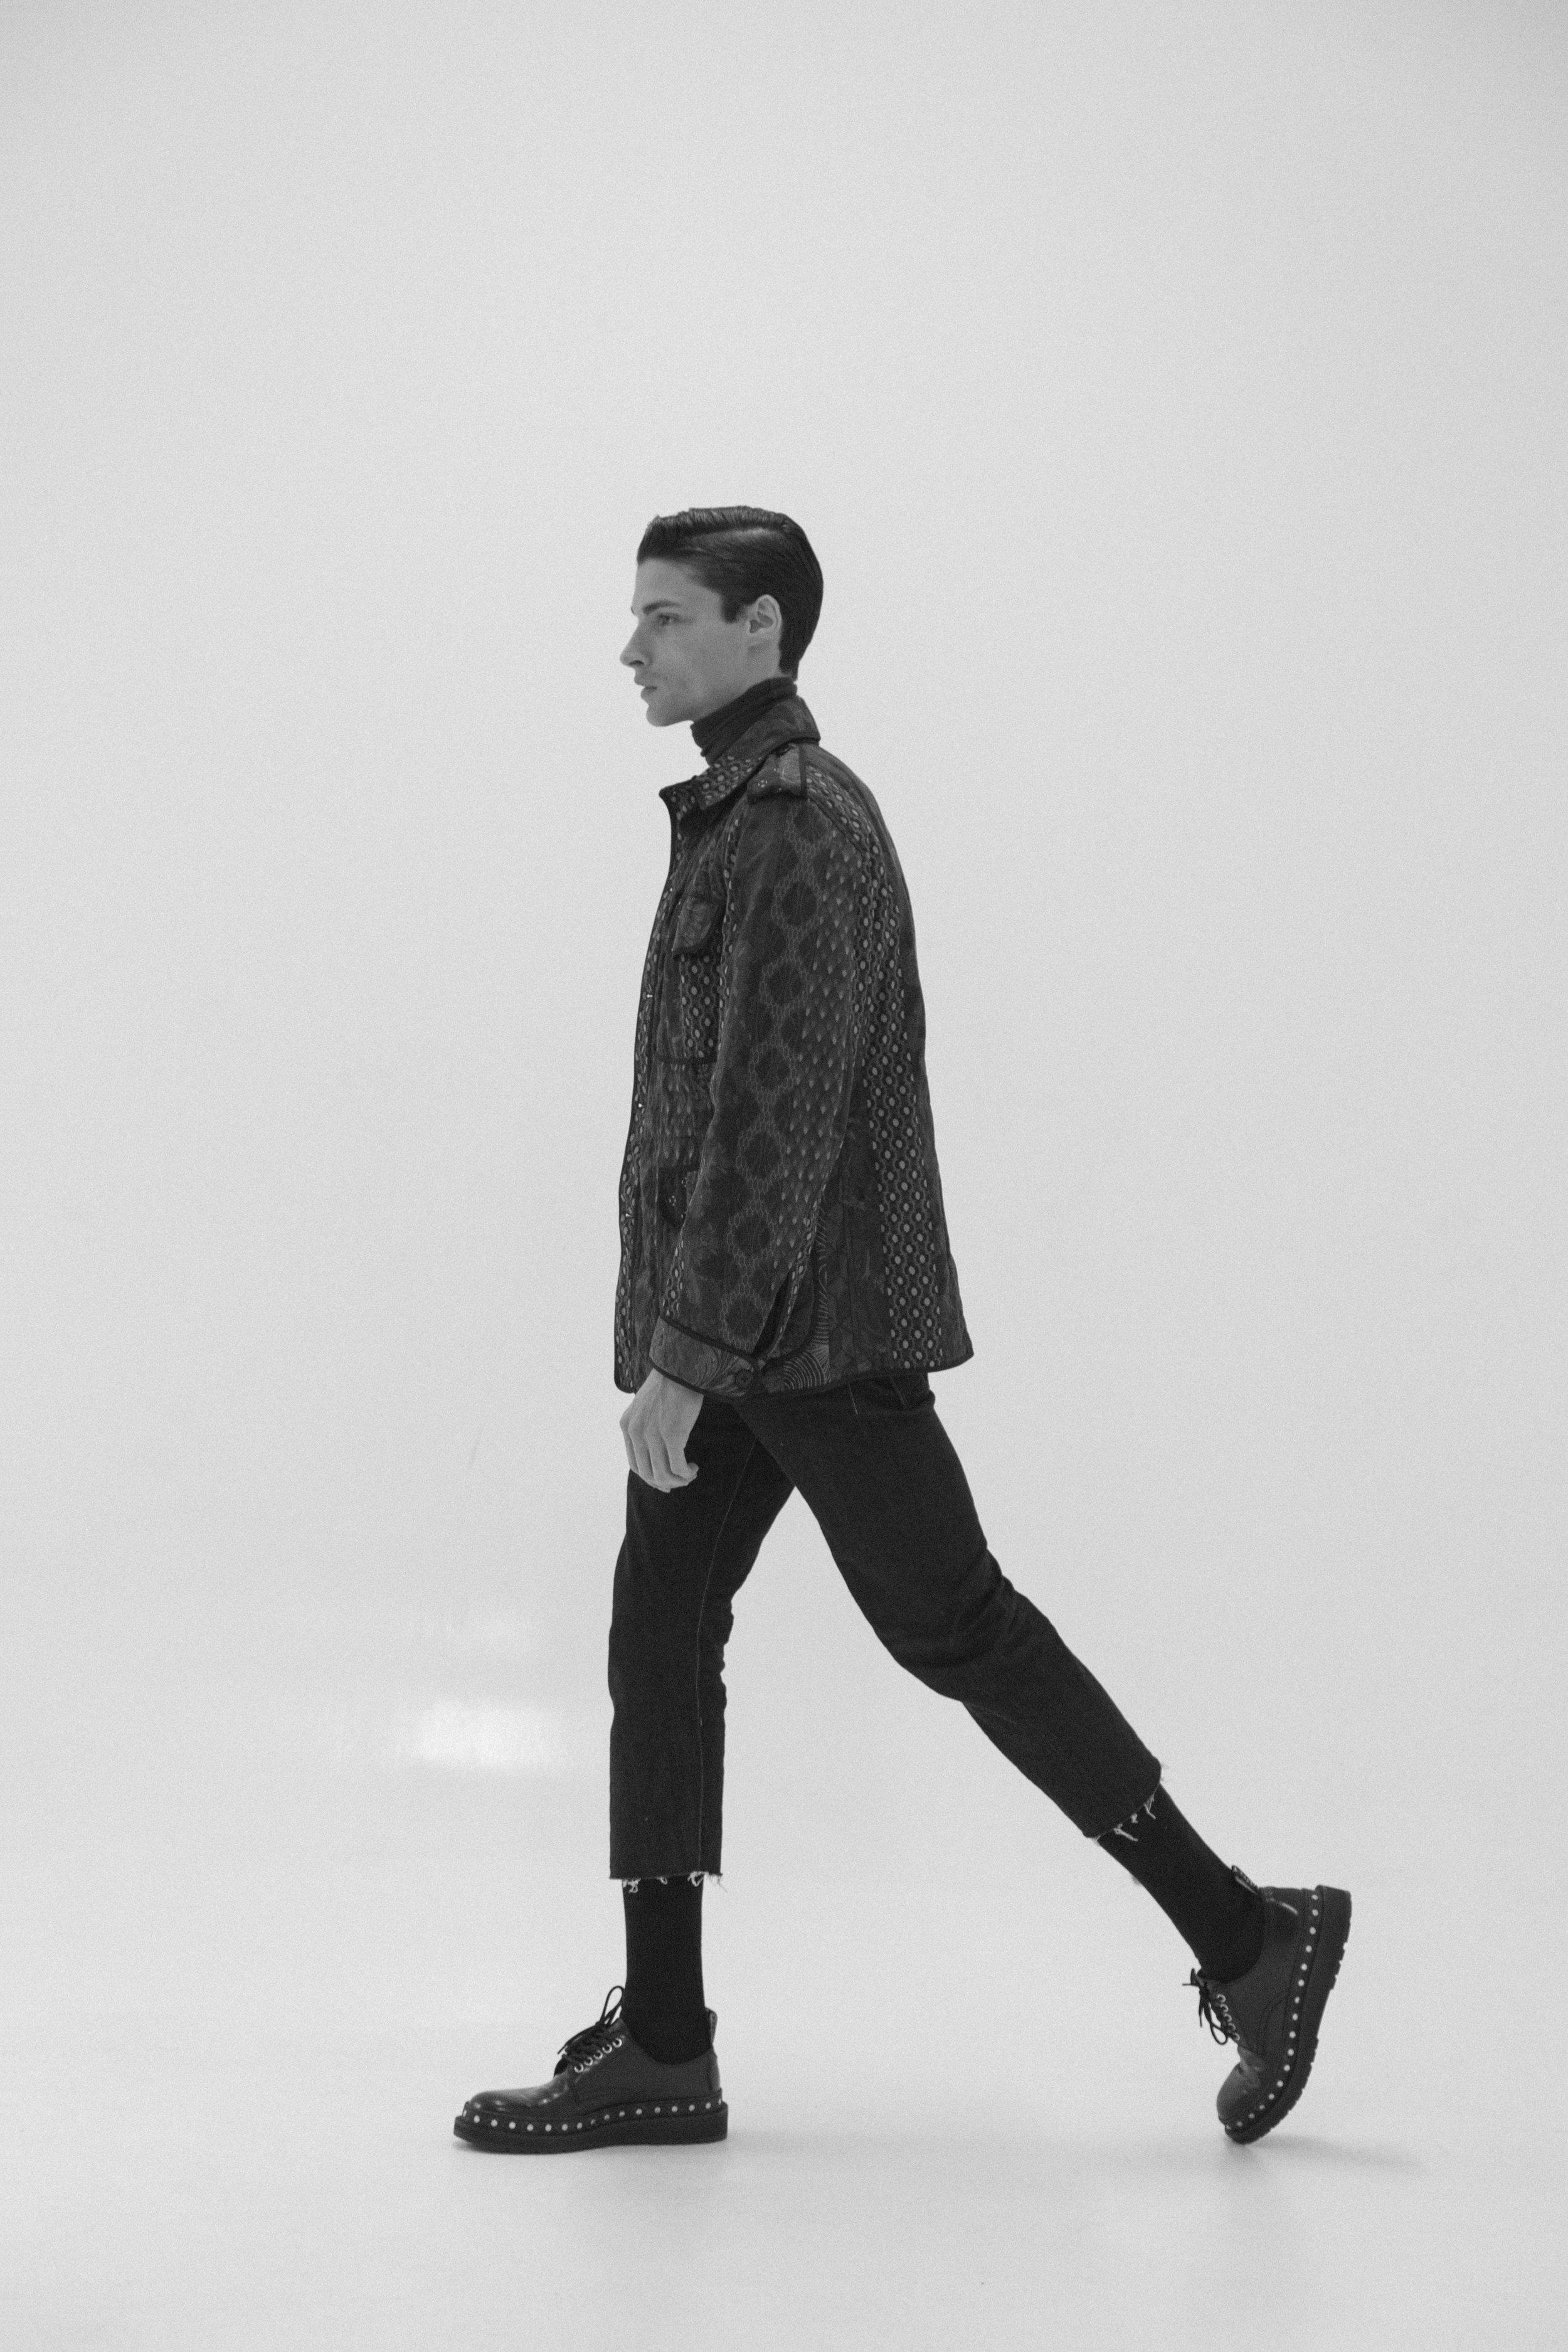 Saco de  DRIES VAN NOTEN , suéter de  PAL ZILERI  y zapatos de  LOUIS VUITTON.